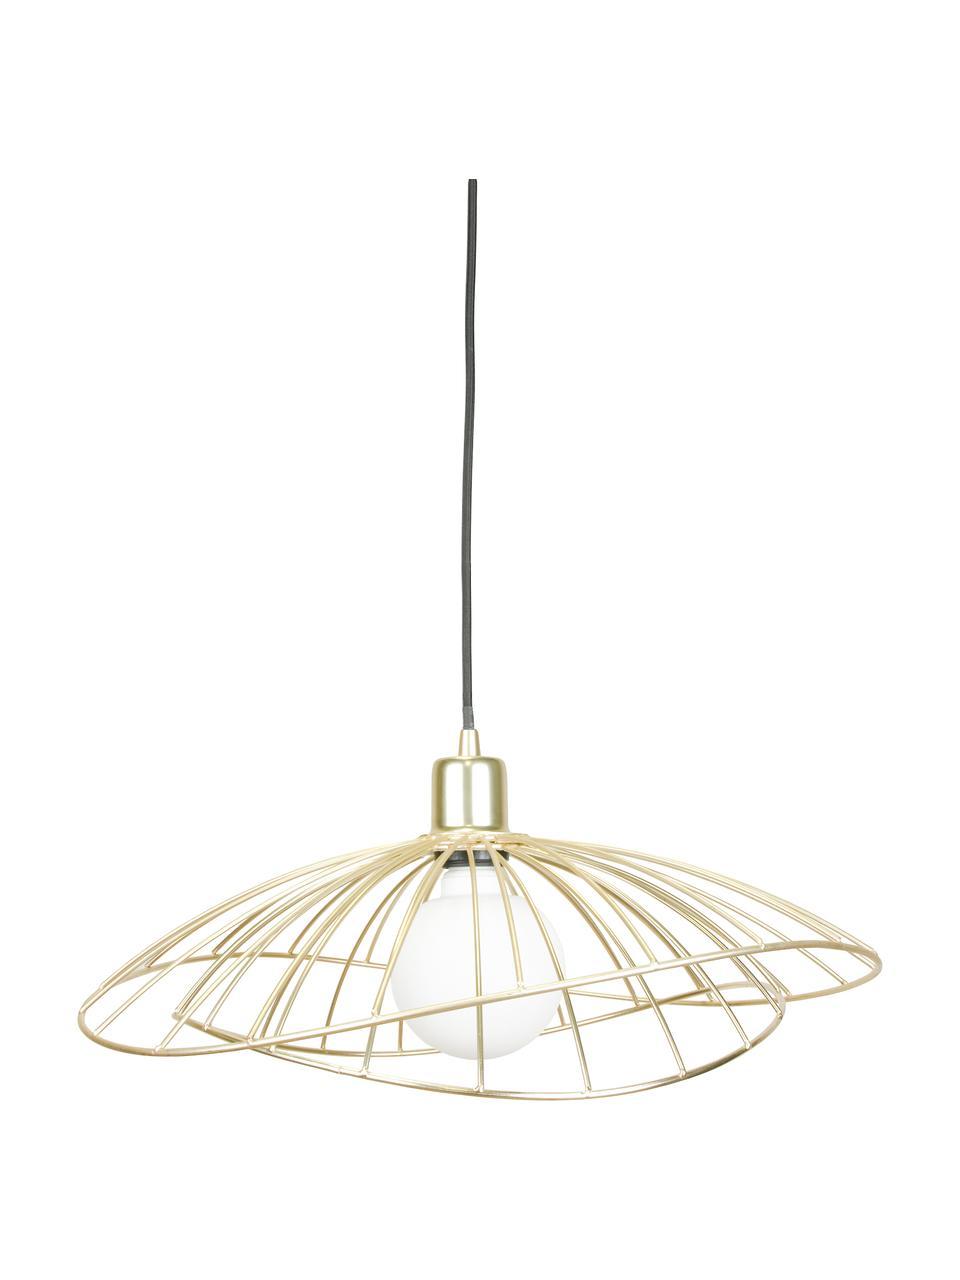 Design Pendelleuchte Ray in Gold, Lampenschirm: Metall, vermessingt und g, Baldachin: Metall, lackiert, Messingfarben, gebürstet, Ø 45 x H 25 cm